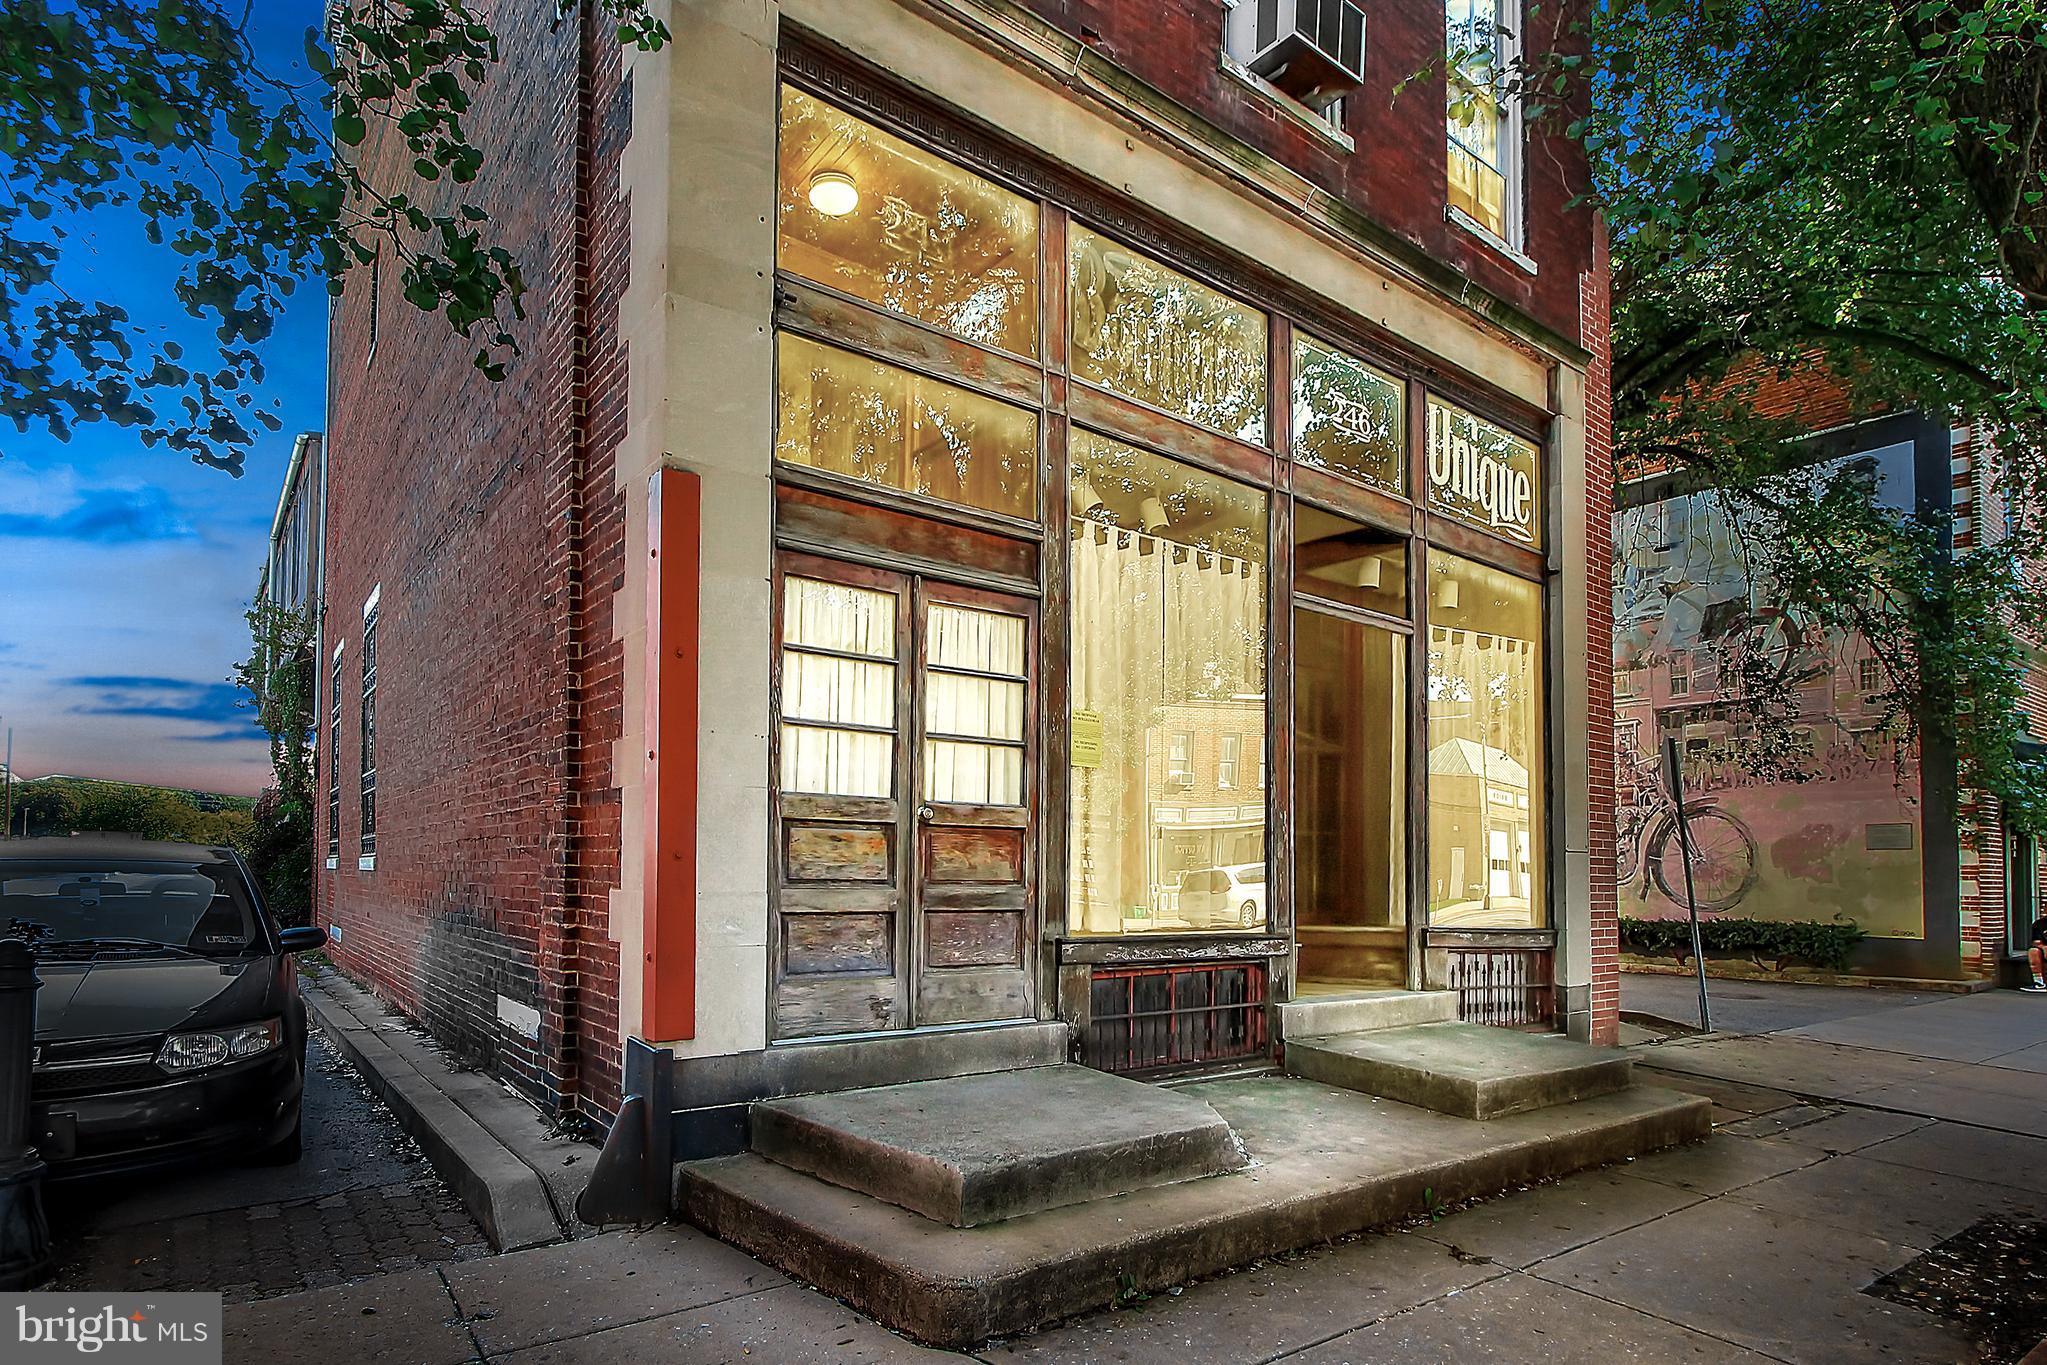 244 W MARKET STREET, YORK, PA 17401